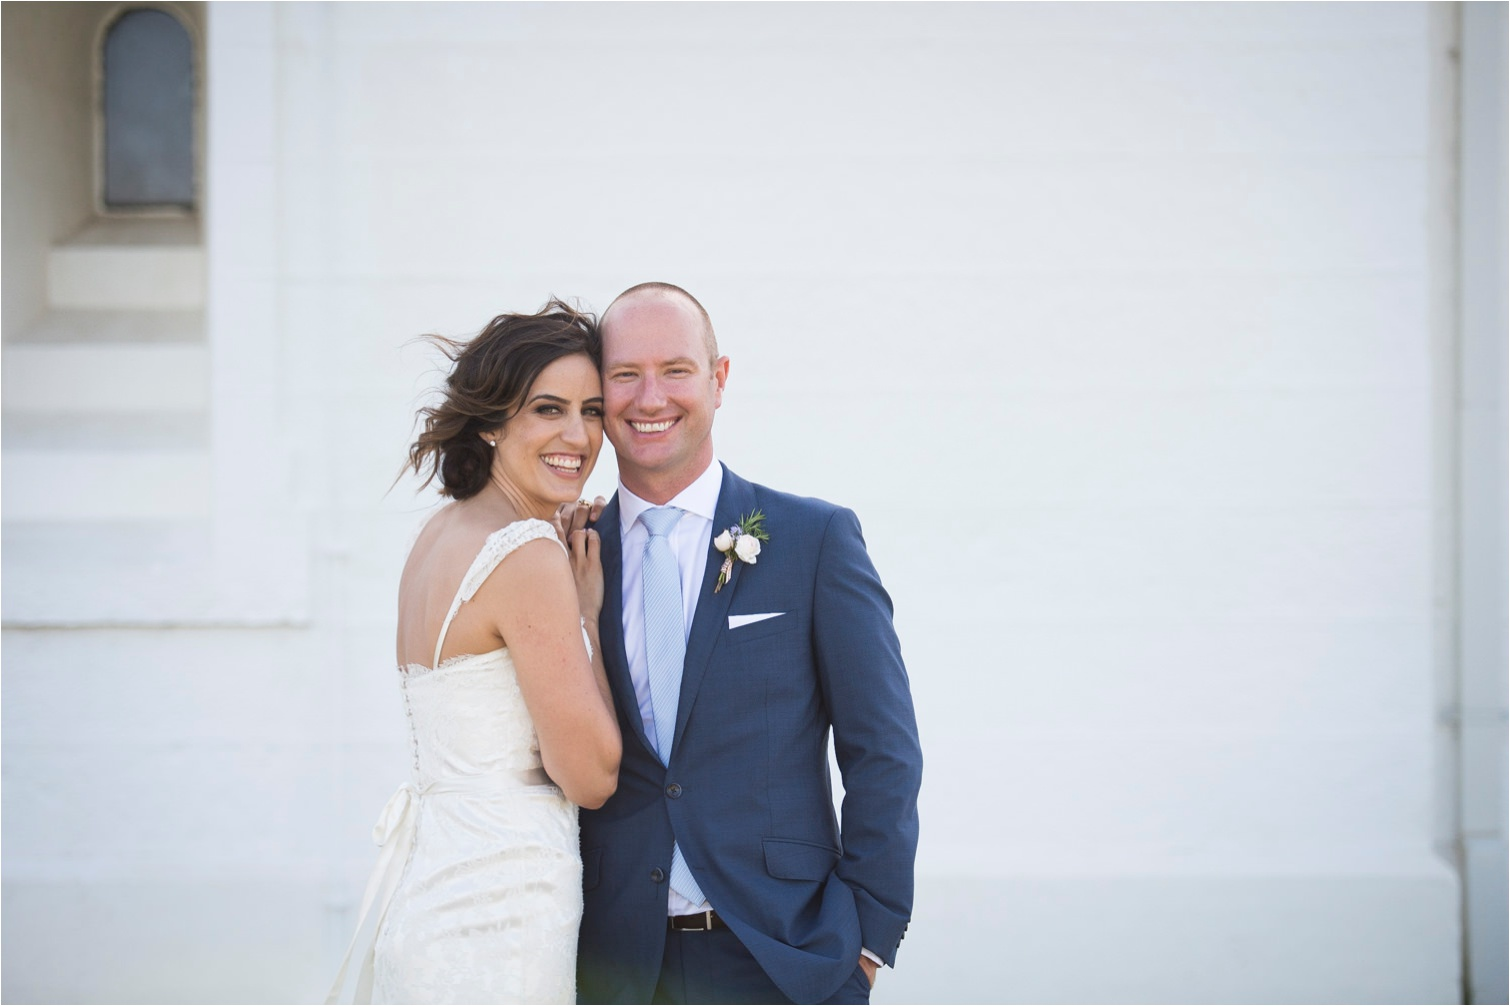 Nicole&Carlie_Watsons_Bay_Hotel_Wedding_by_Gold_Coast_Photographers-The_Follans32.jpg